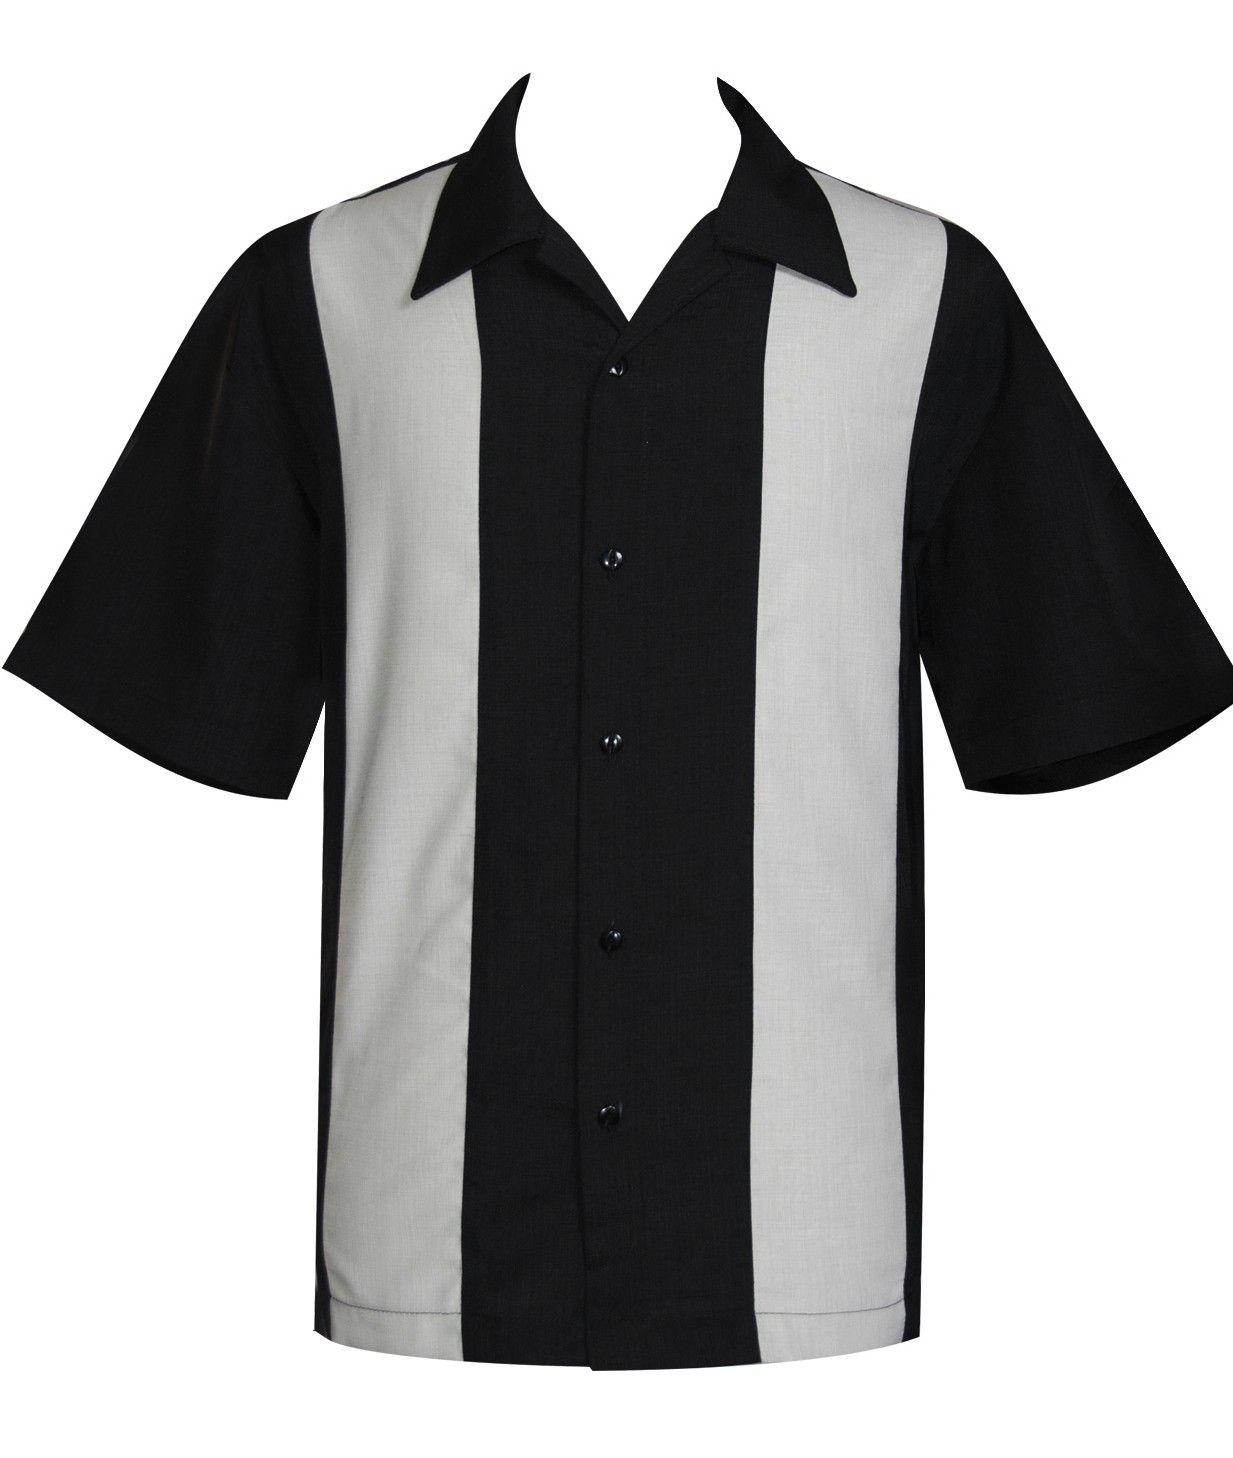 The Bouncer Mens Bowling Camp Shirts Man Fashion Pinterest